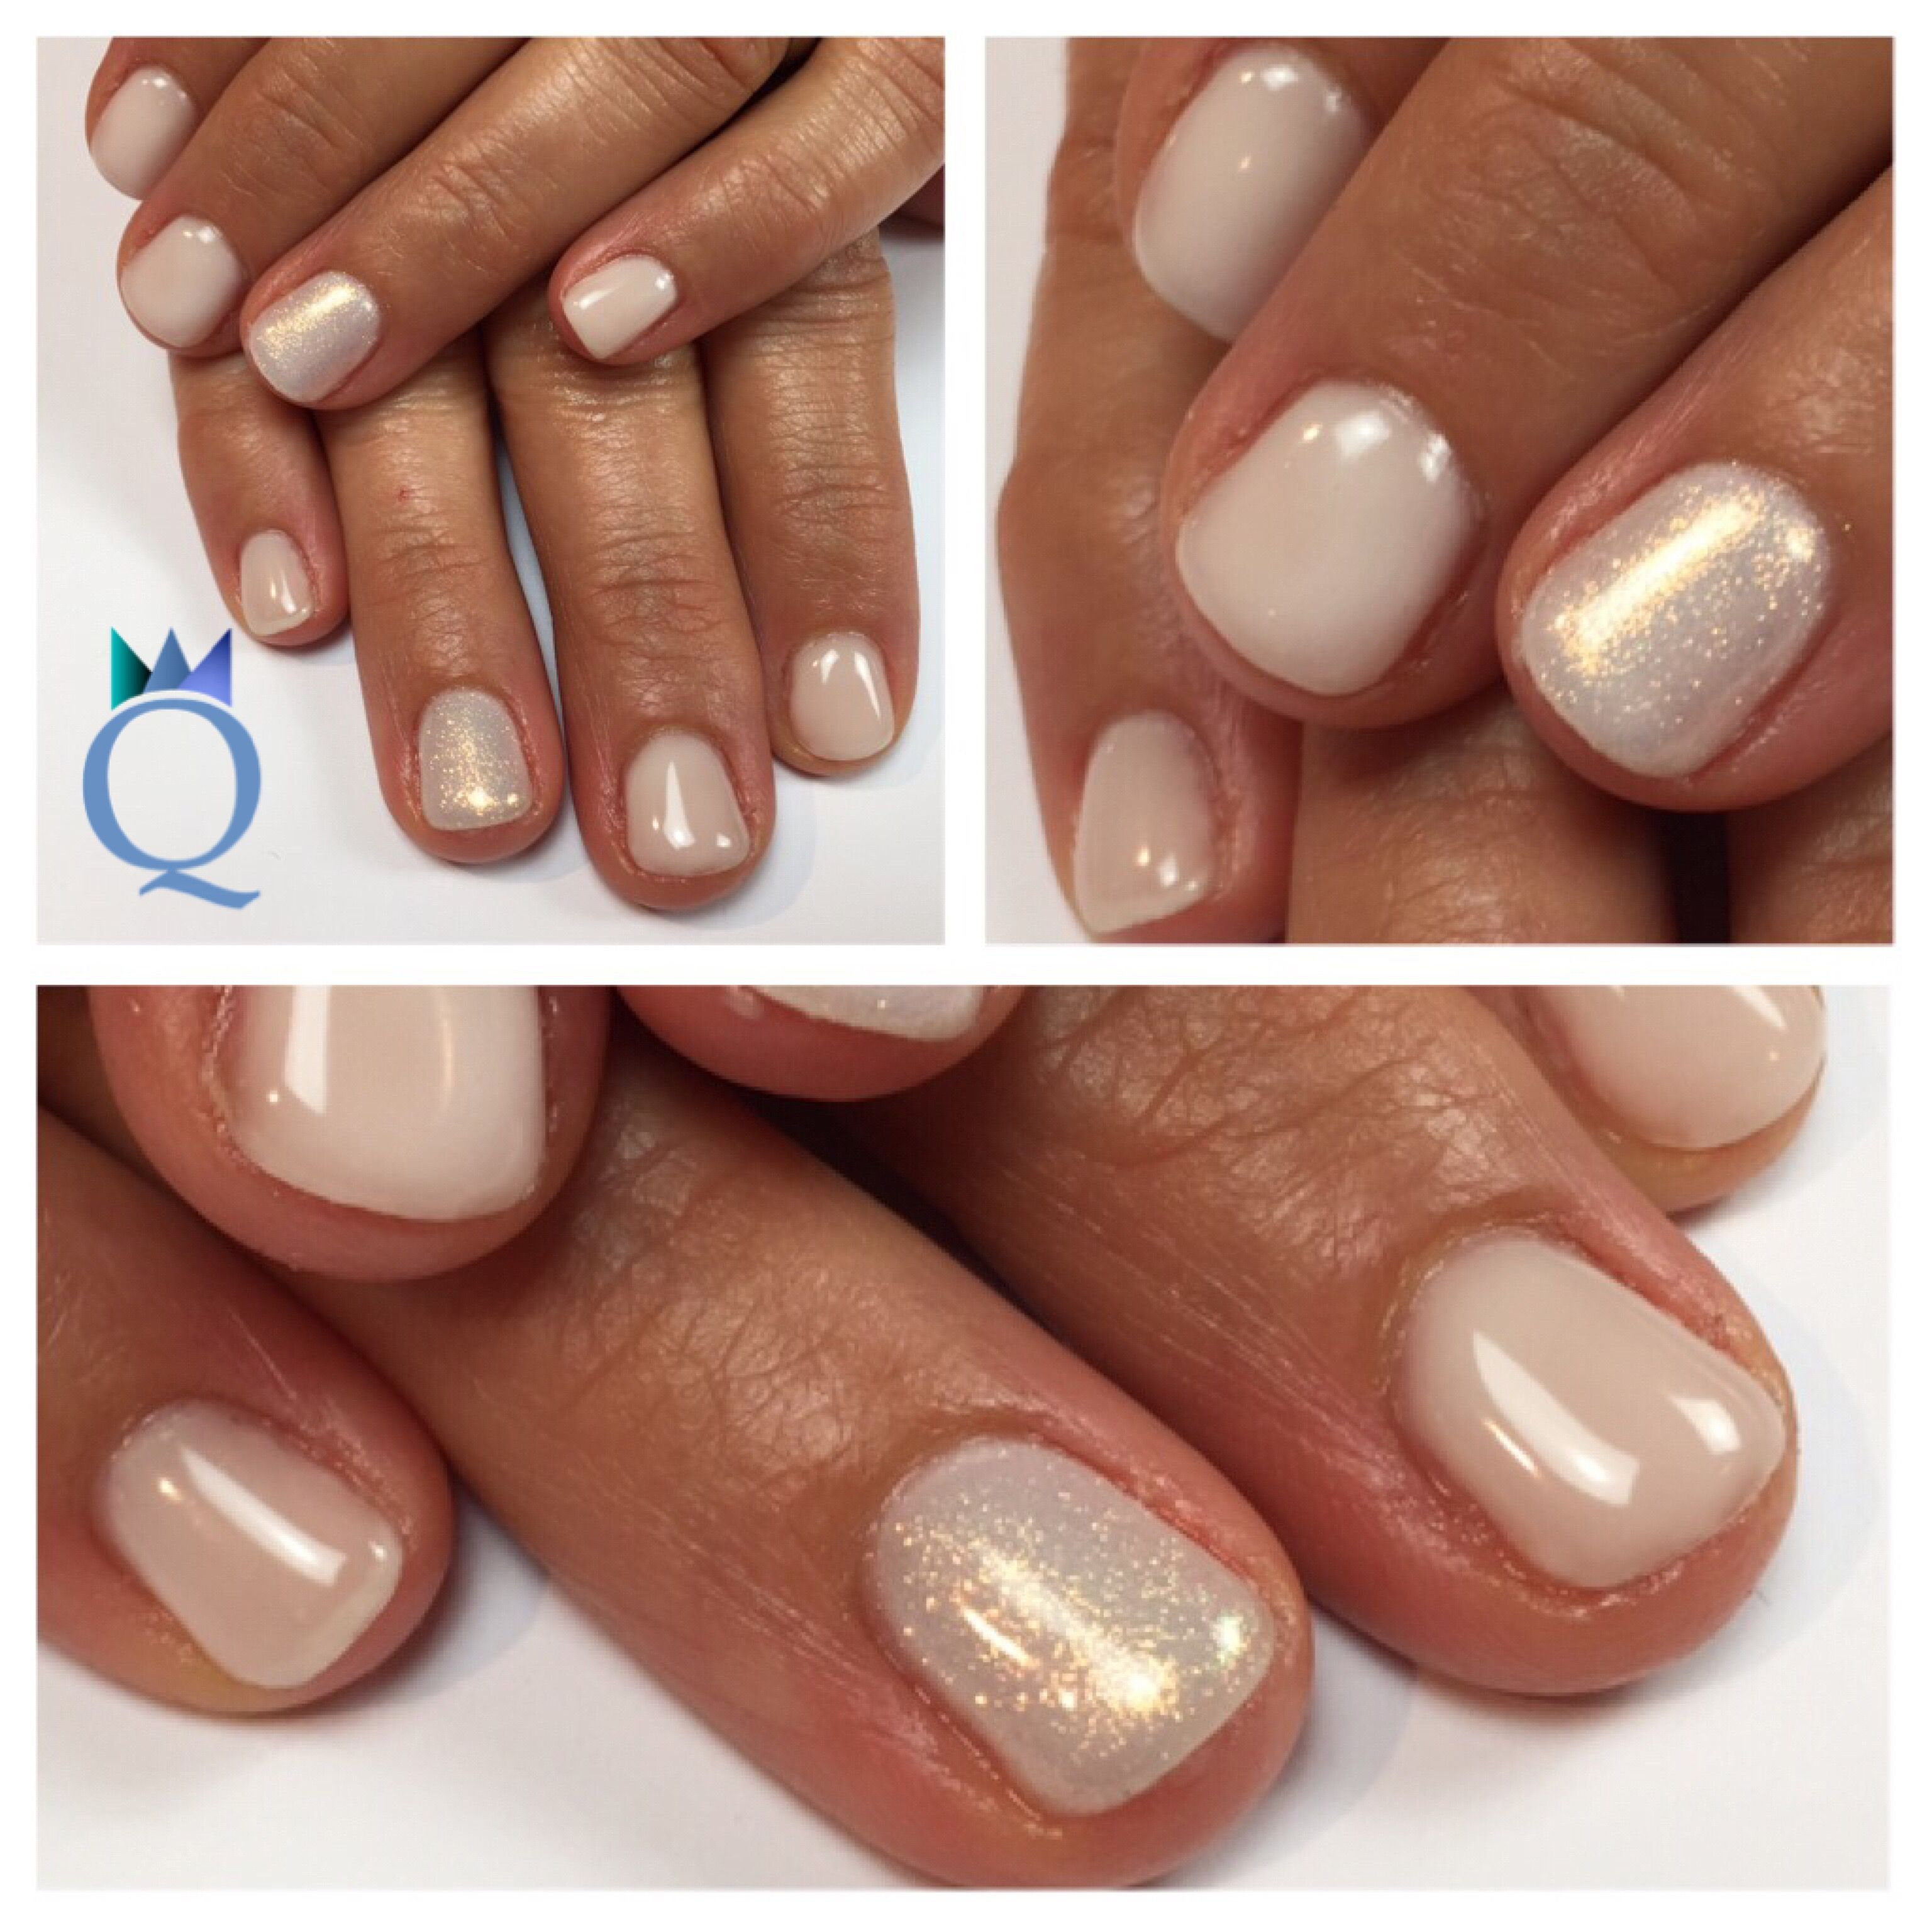 shortnails #gelnails #nails #white #mermaidpigment #kurzenägel ...